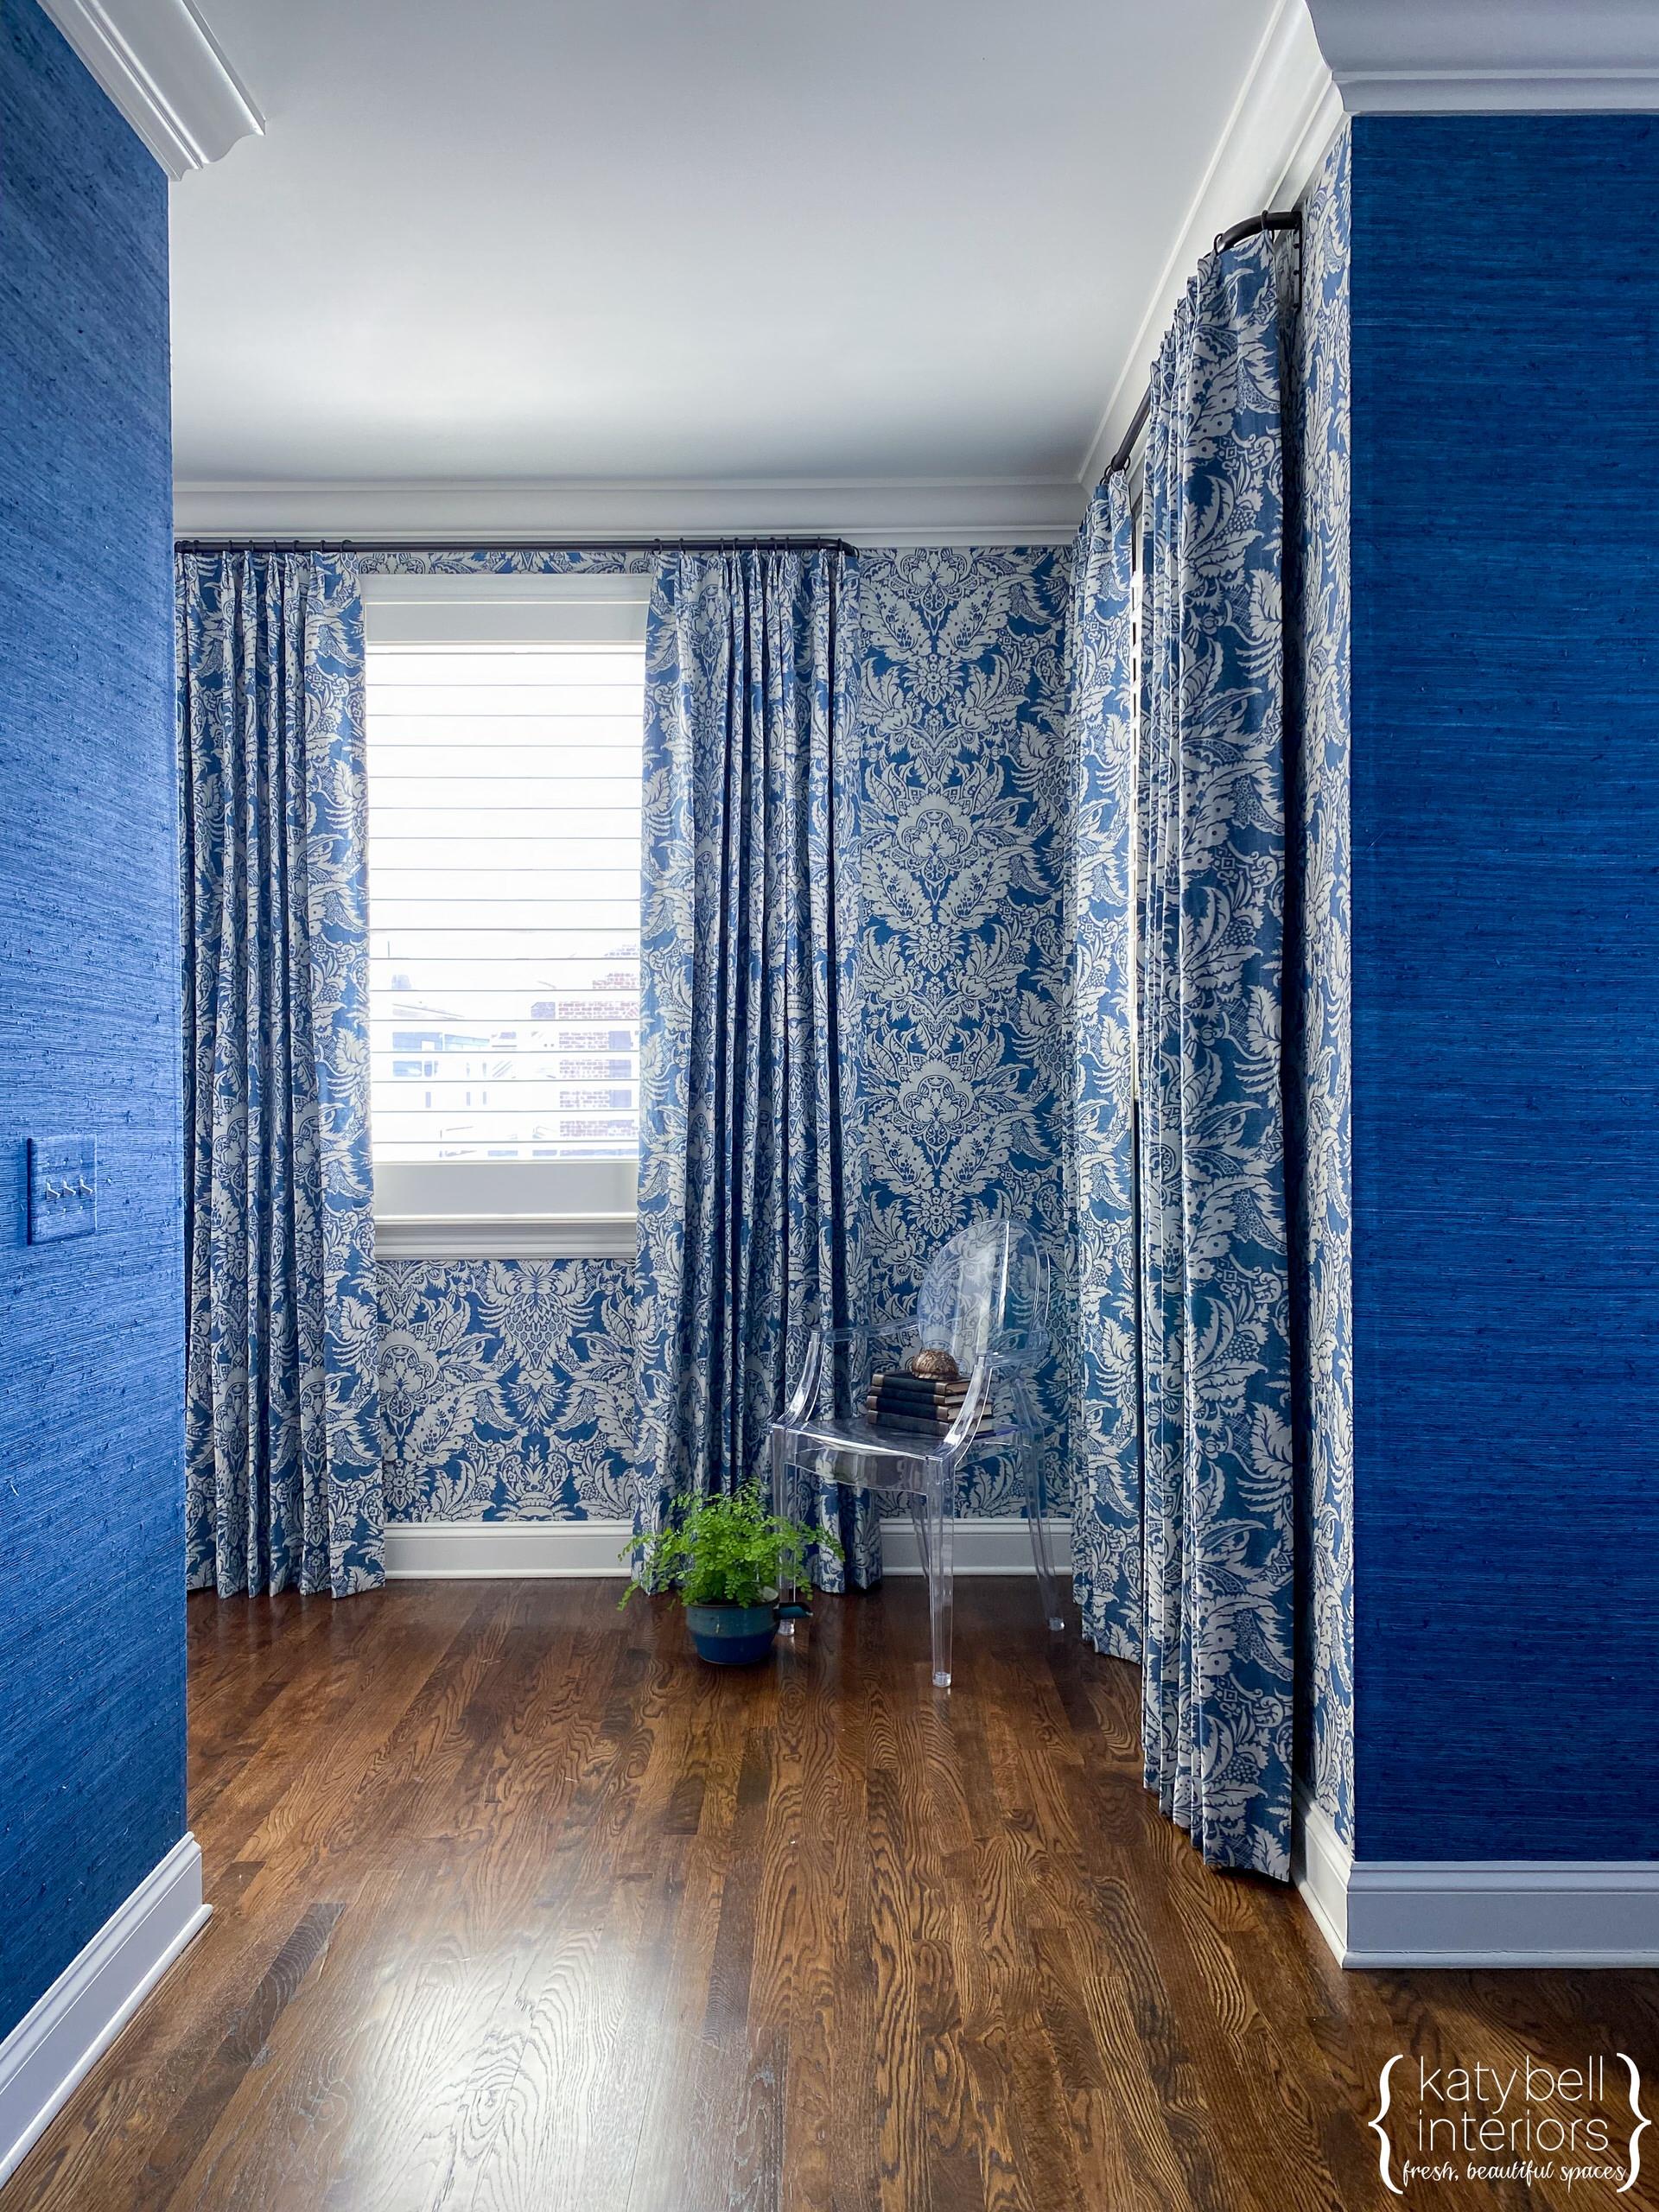 Media Room, Denim Blue Textured Grasscloth, Custom Draperies